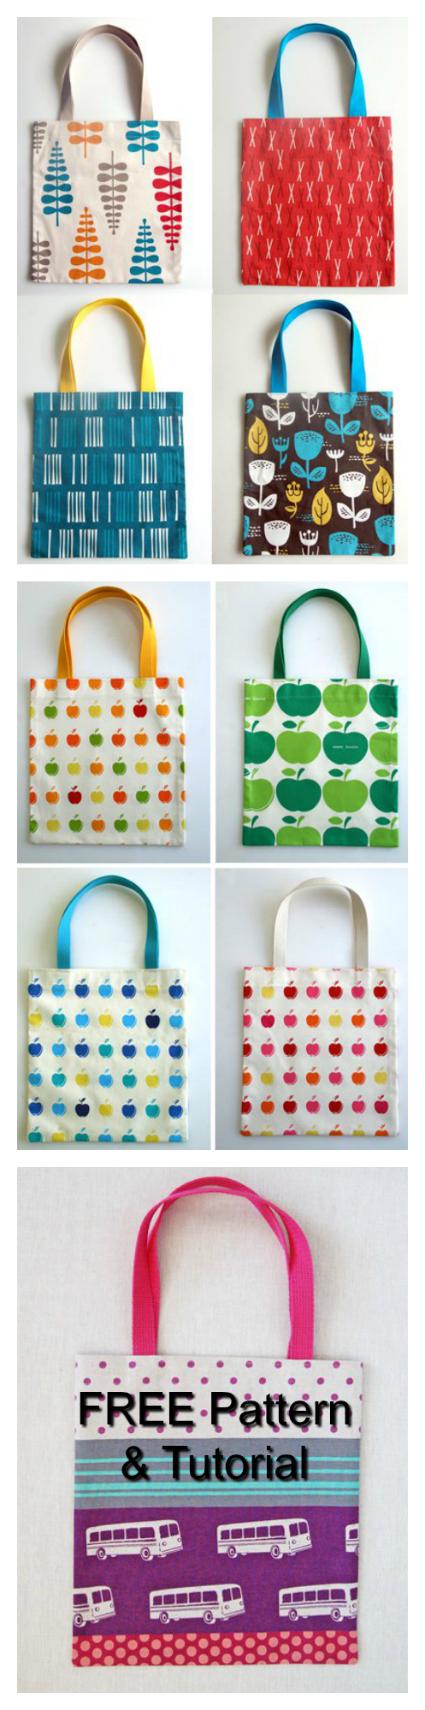 The Twenty Minute Tote Bag FREE sewing pattern & tutorial.